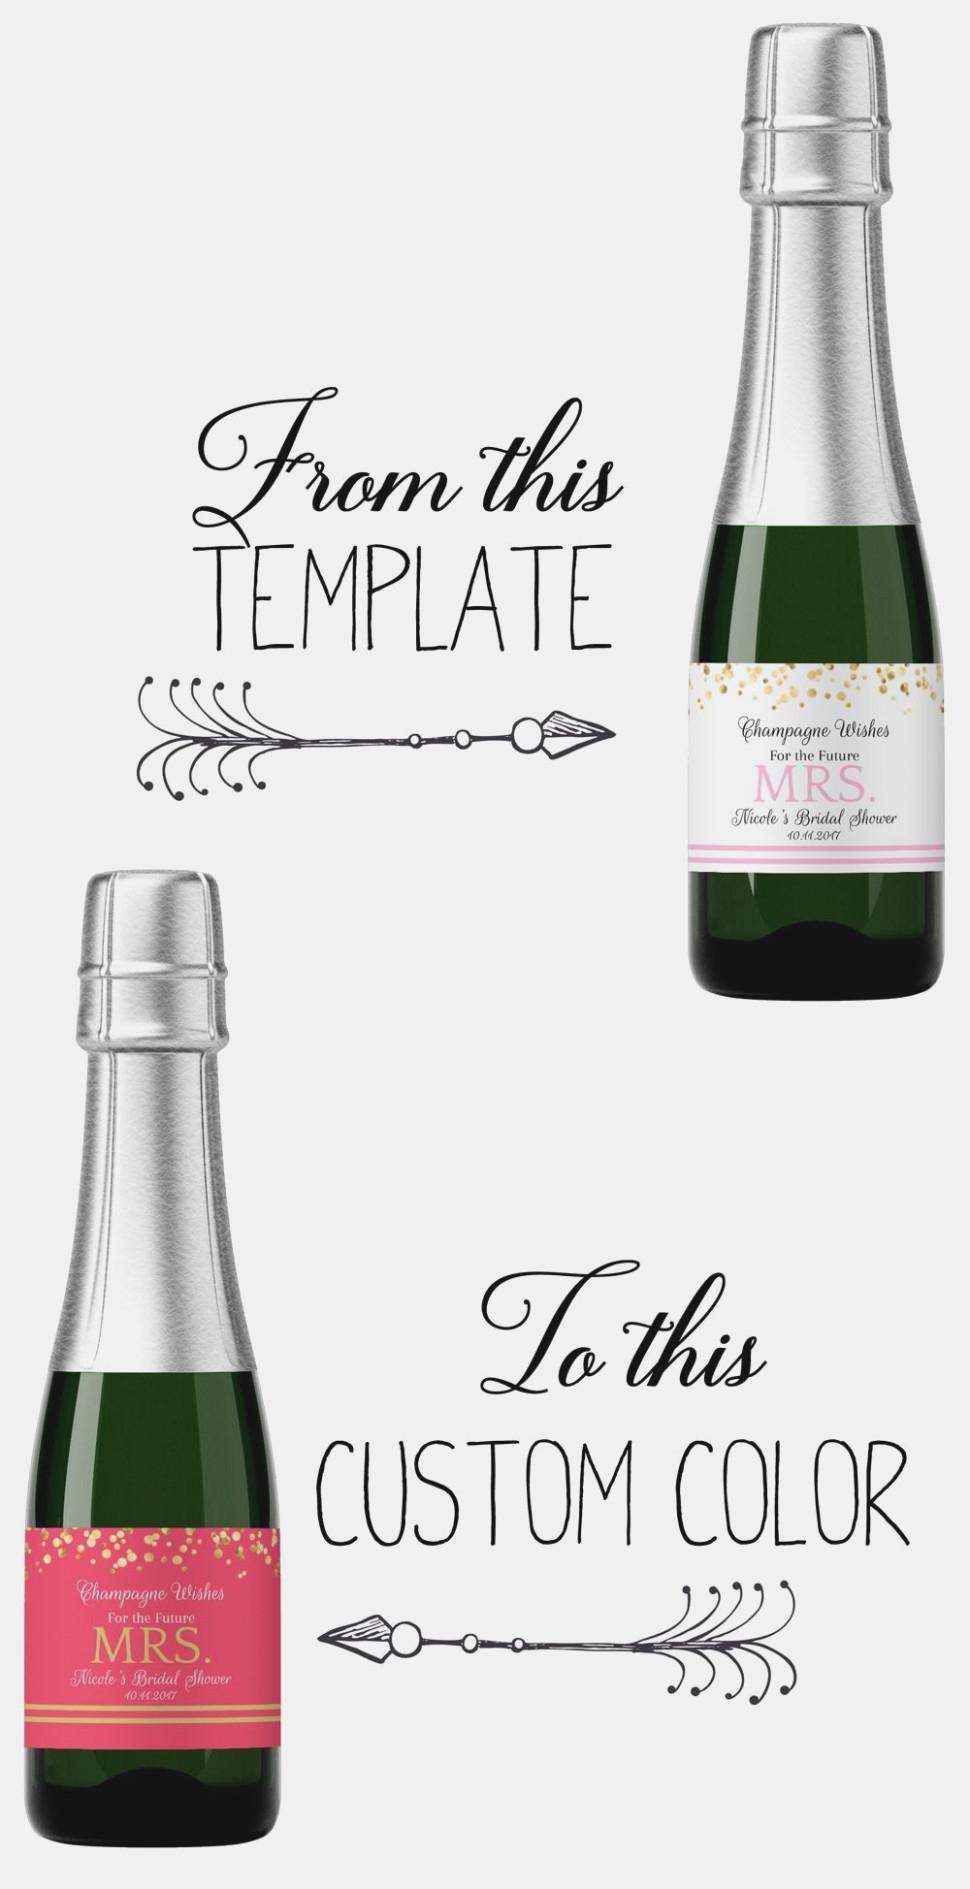 Free Printable Mini Champagne Bottle Labels Labels For Mini - Free Printable Mini Champagne Bottle Labels